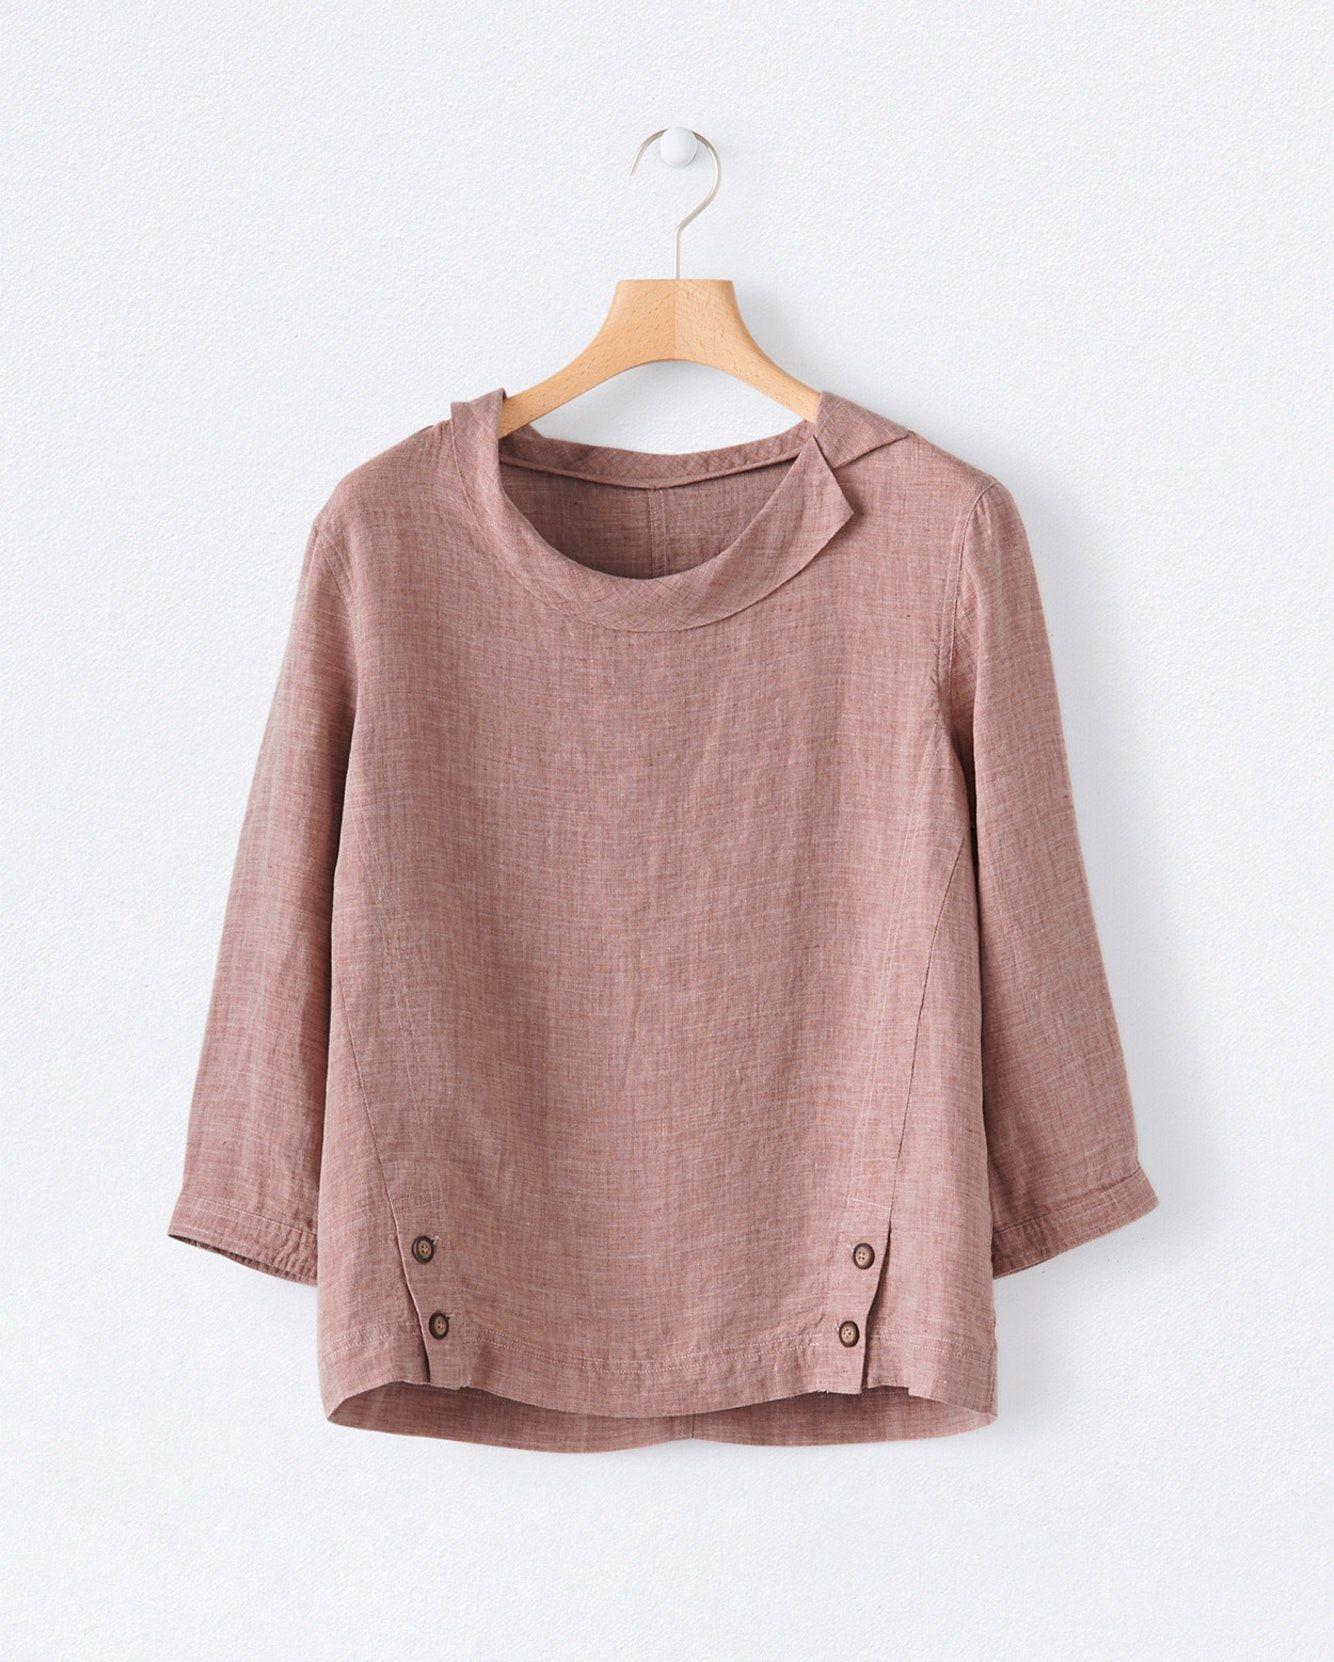 Image of Round collar linen top   Áo thời trang   Pinterest   Blusas ...